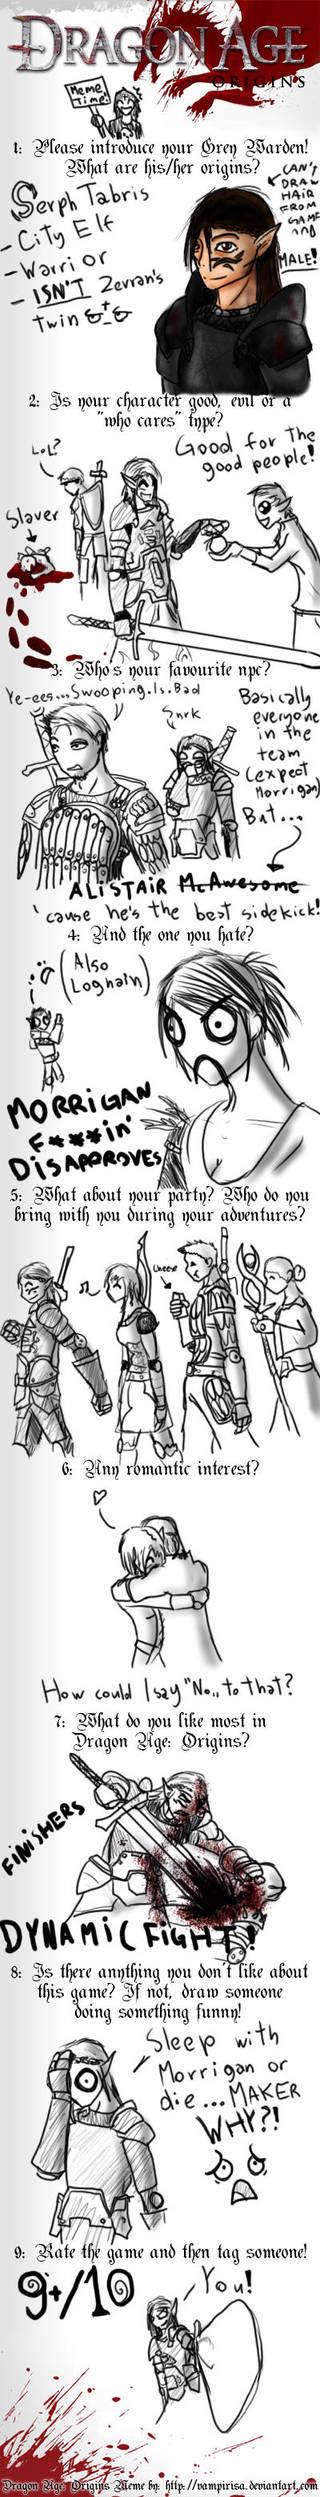 Dragon Age Meme by xDeadbrainx